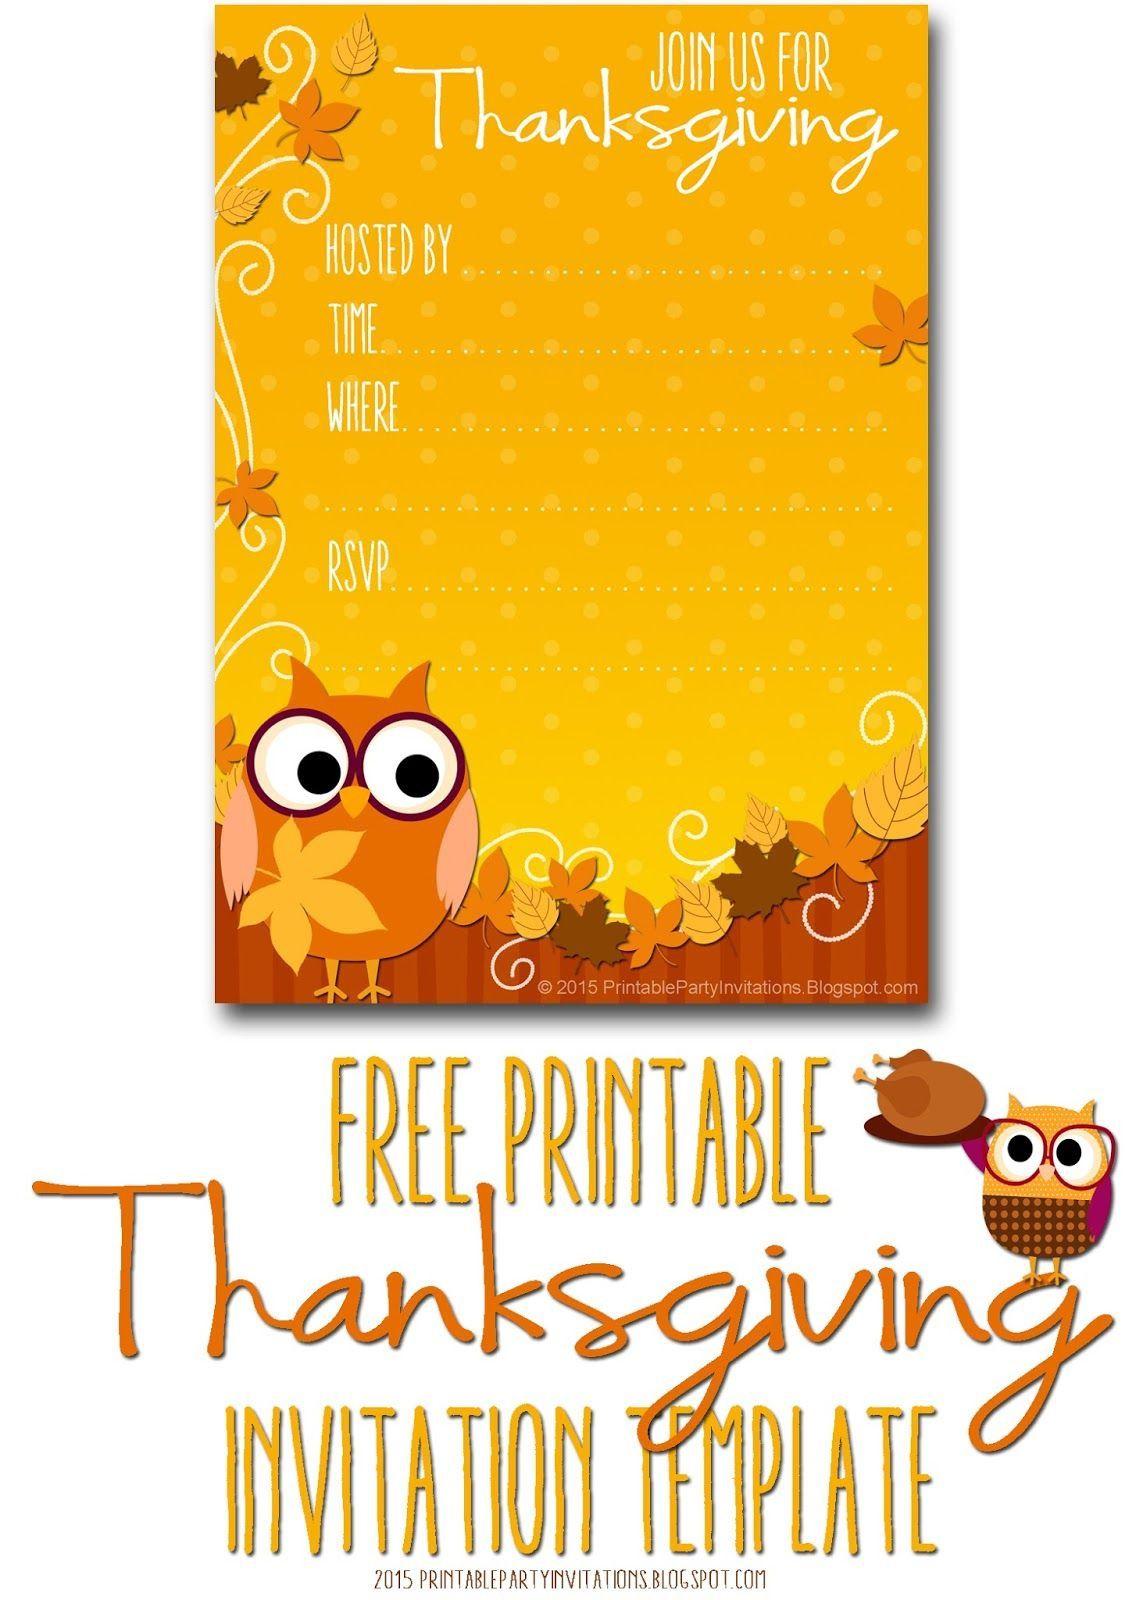 004 Singular Free Thanksgiving Invitation Template Design  Templates Printable Dinner Download PotluckFull